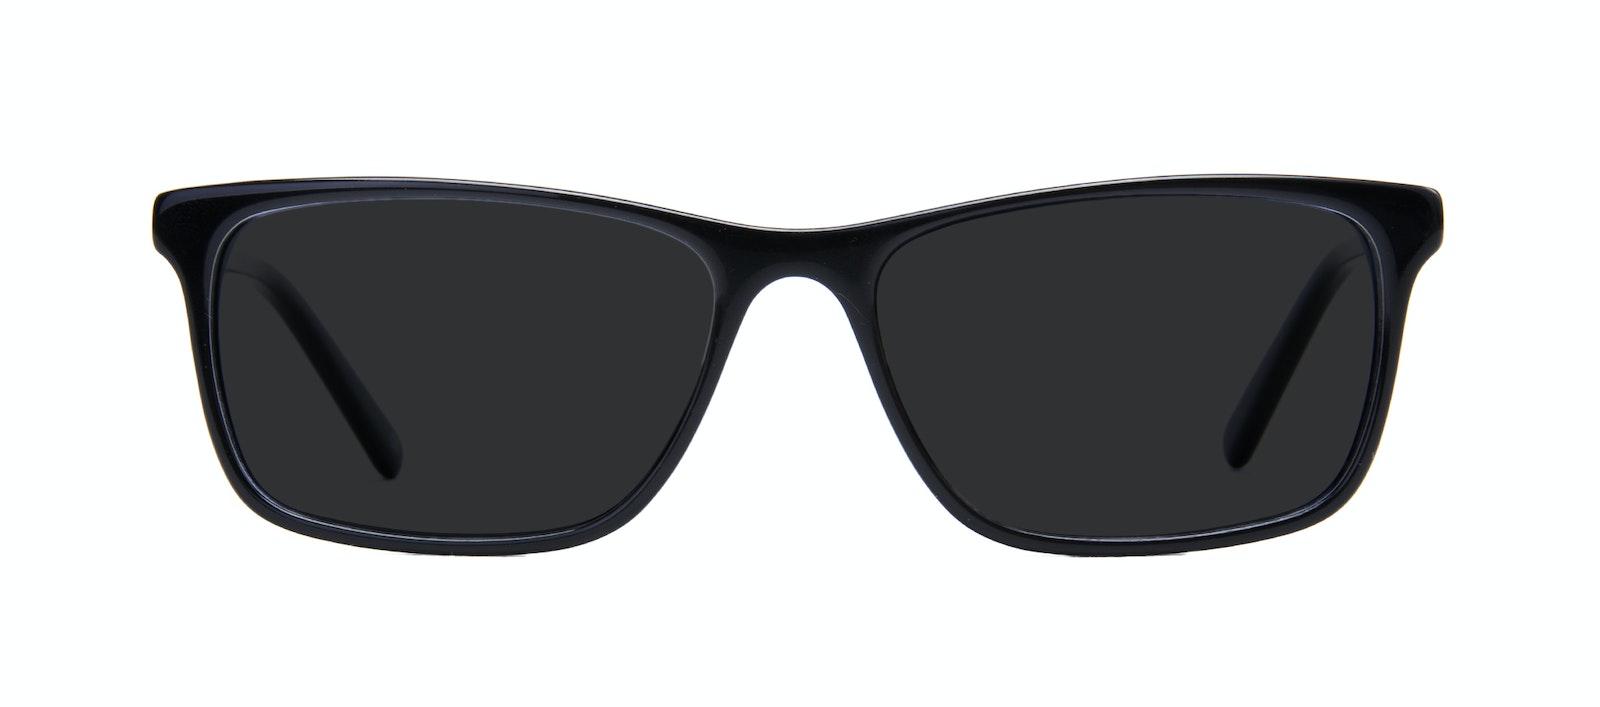 Affordable Fashion Glasses Rectangle Sunglasses Men Henri Black  Front